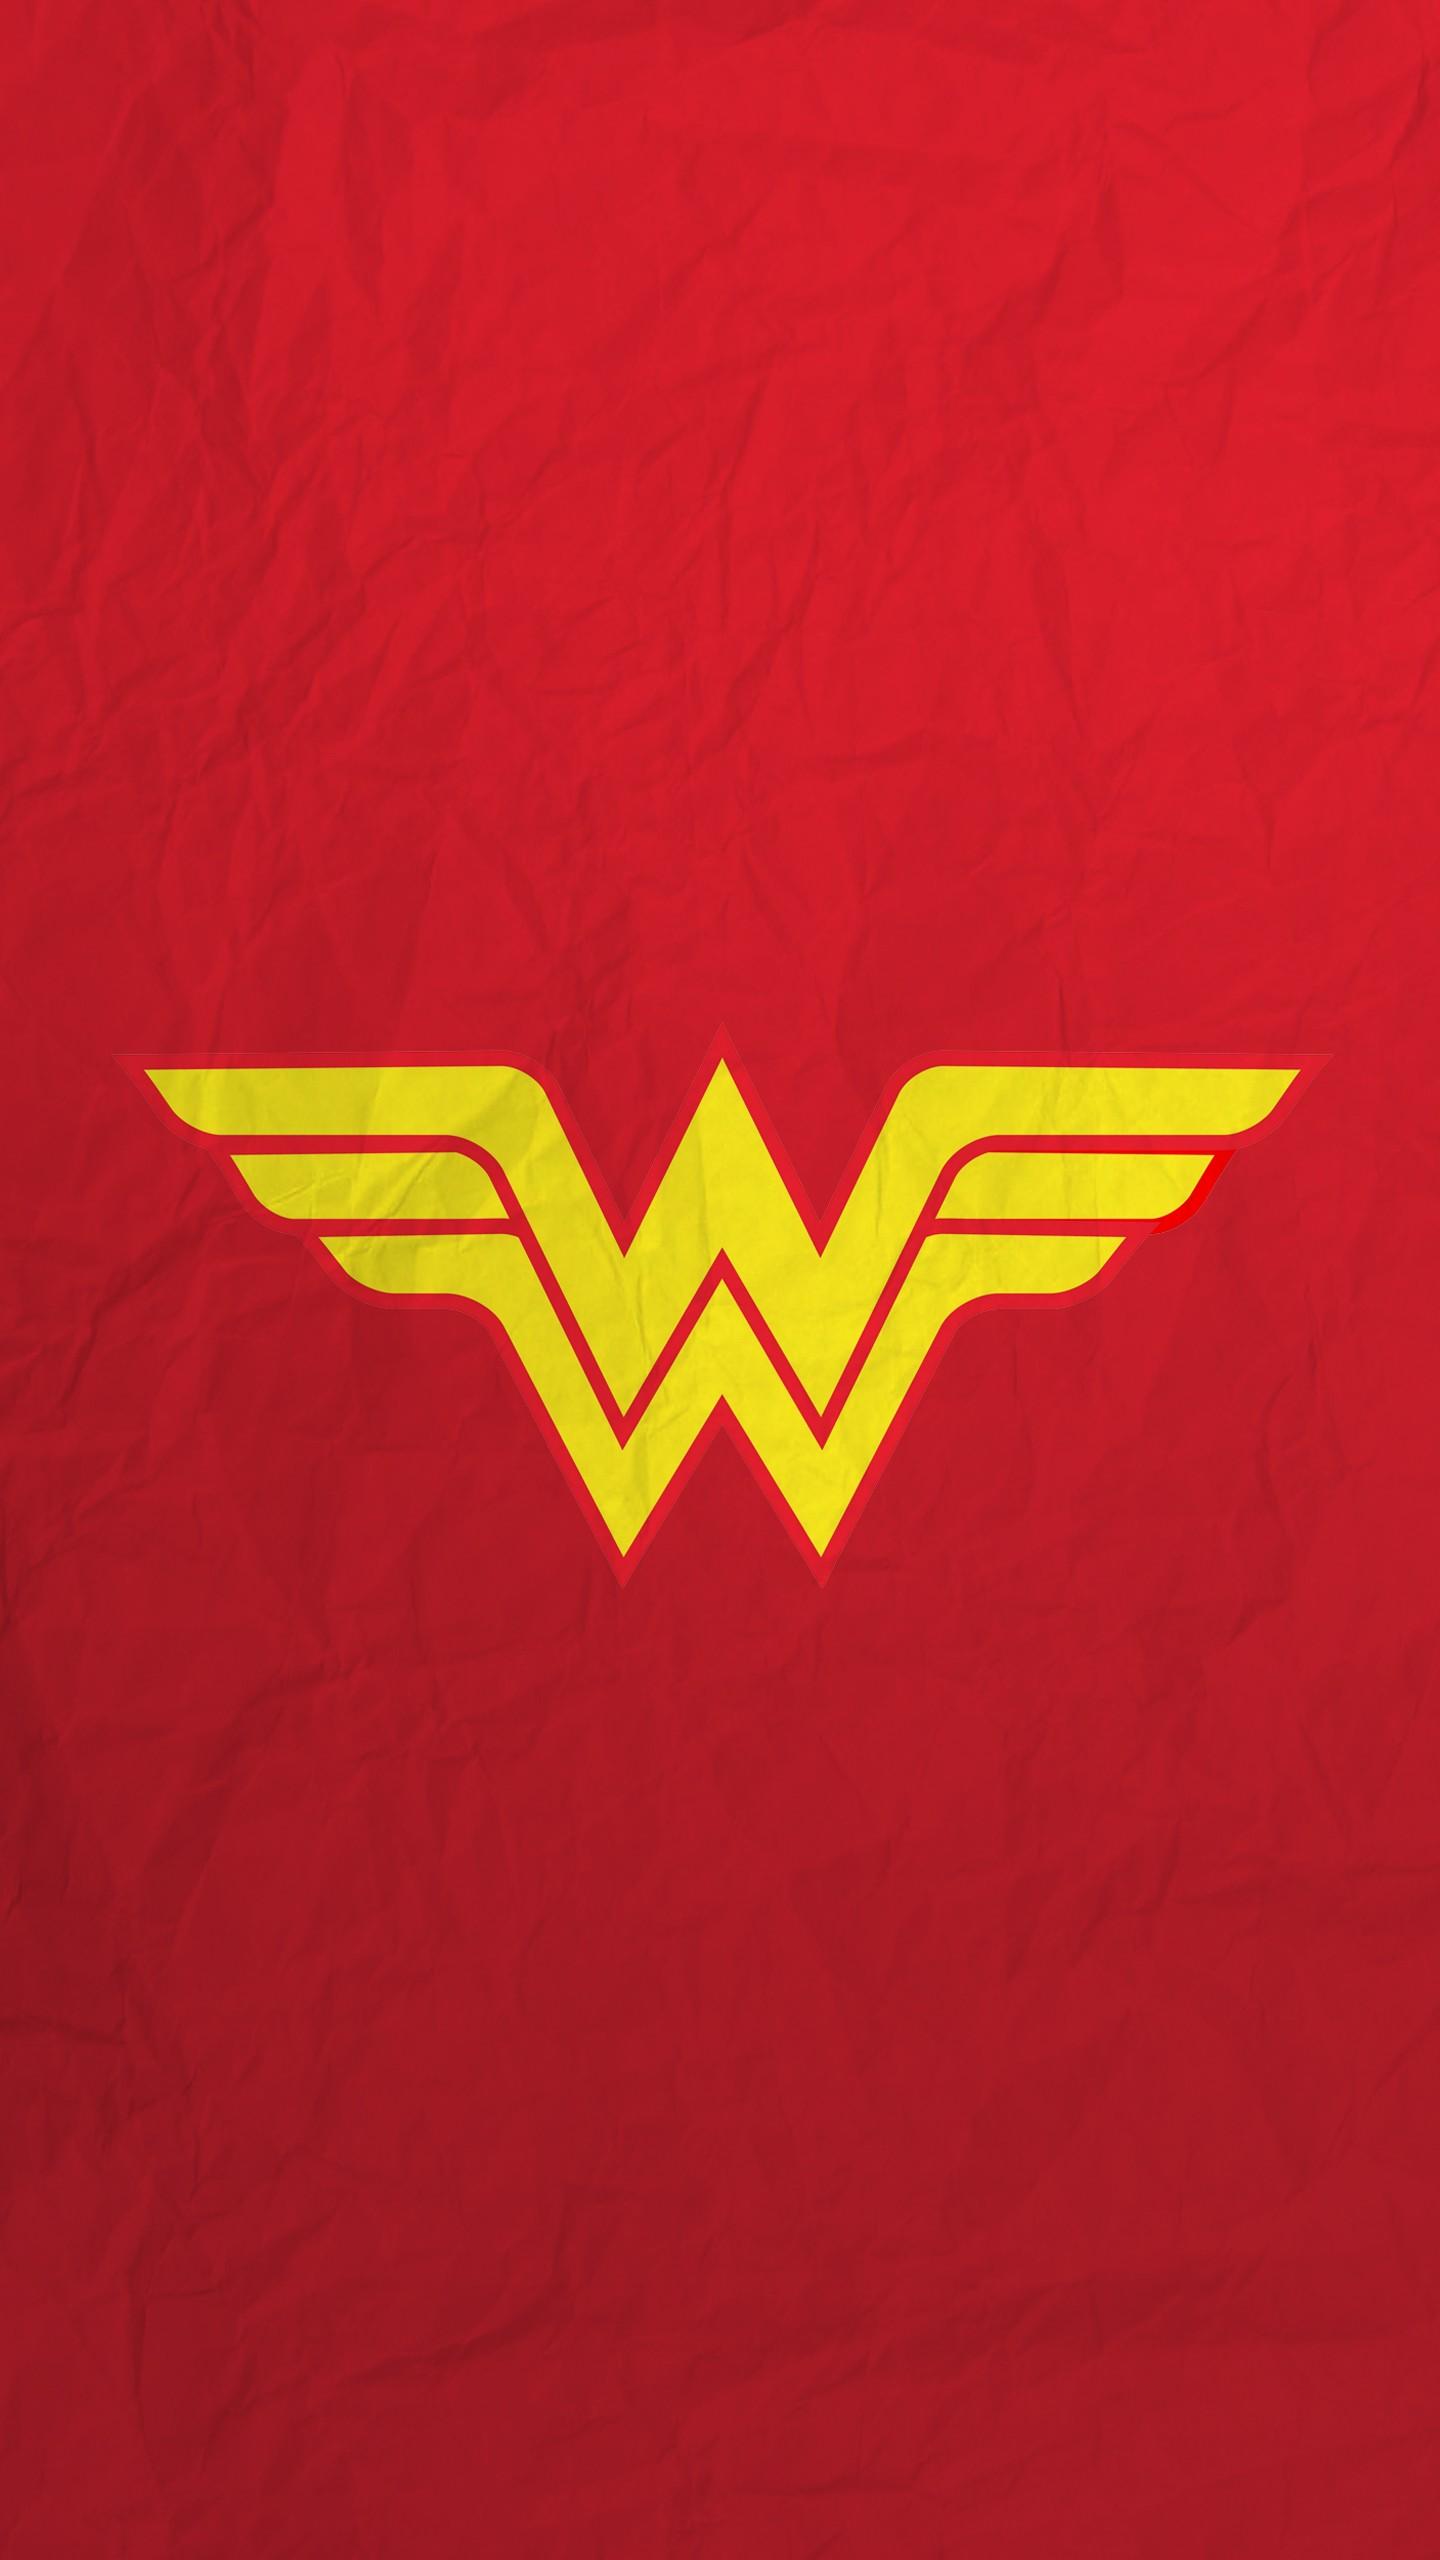 Superhero Wallpaper 09 - 1440x2560